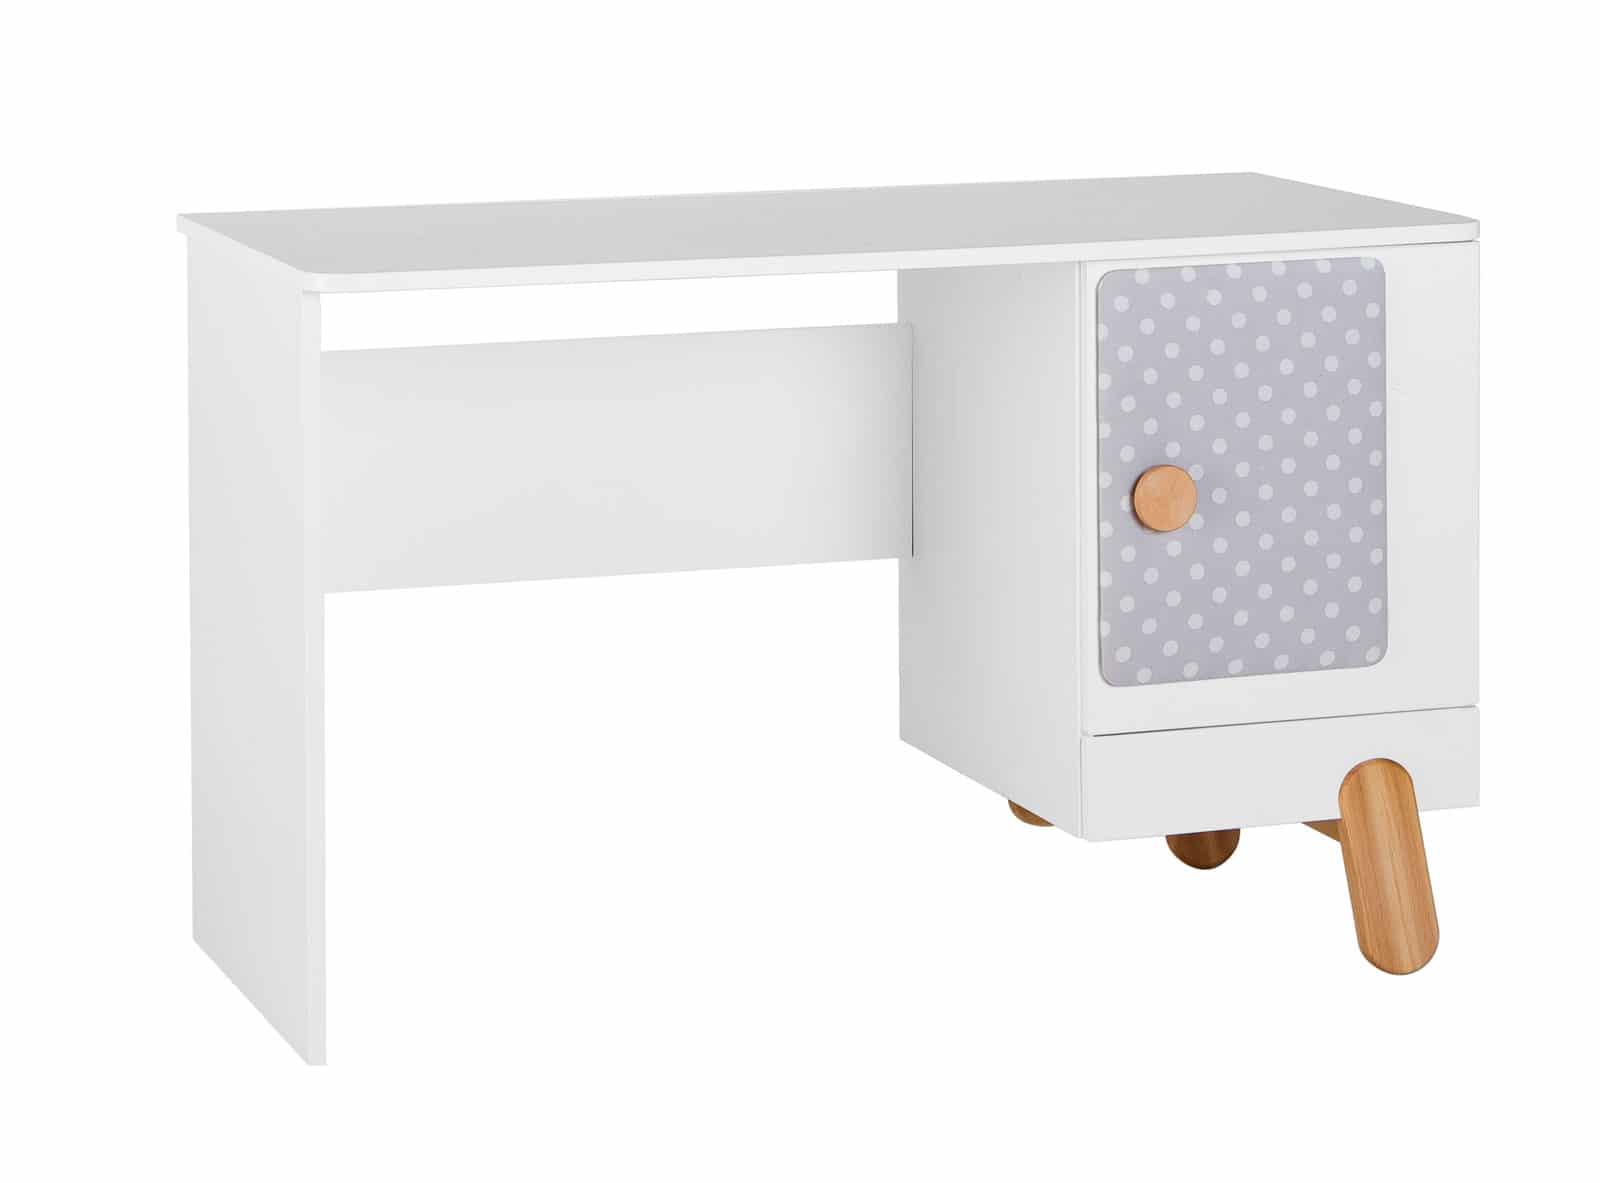 Pinio iga textile 6 meubles lit 140x70 commode for Armoire murale bureau